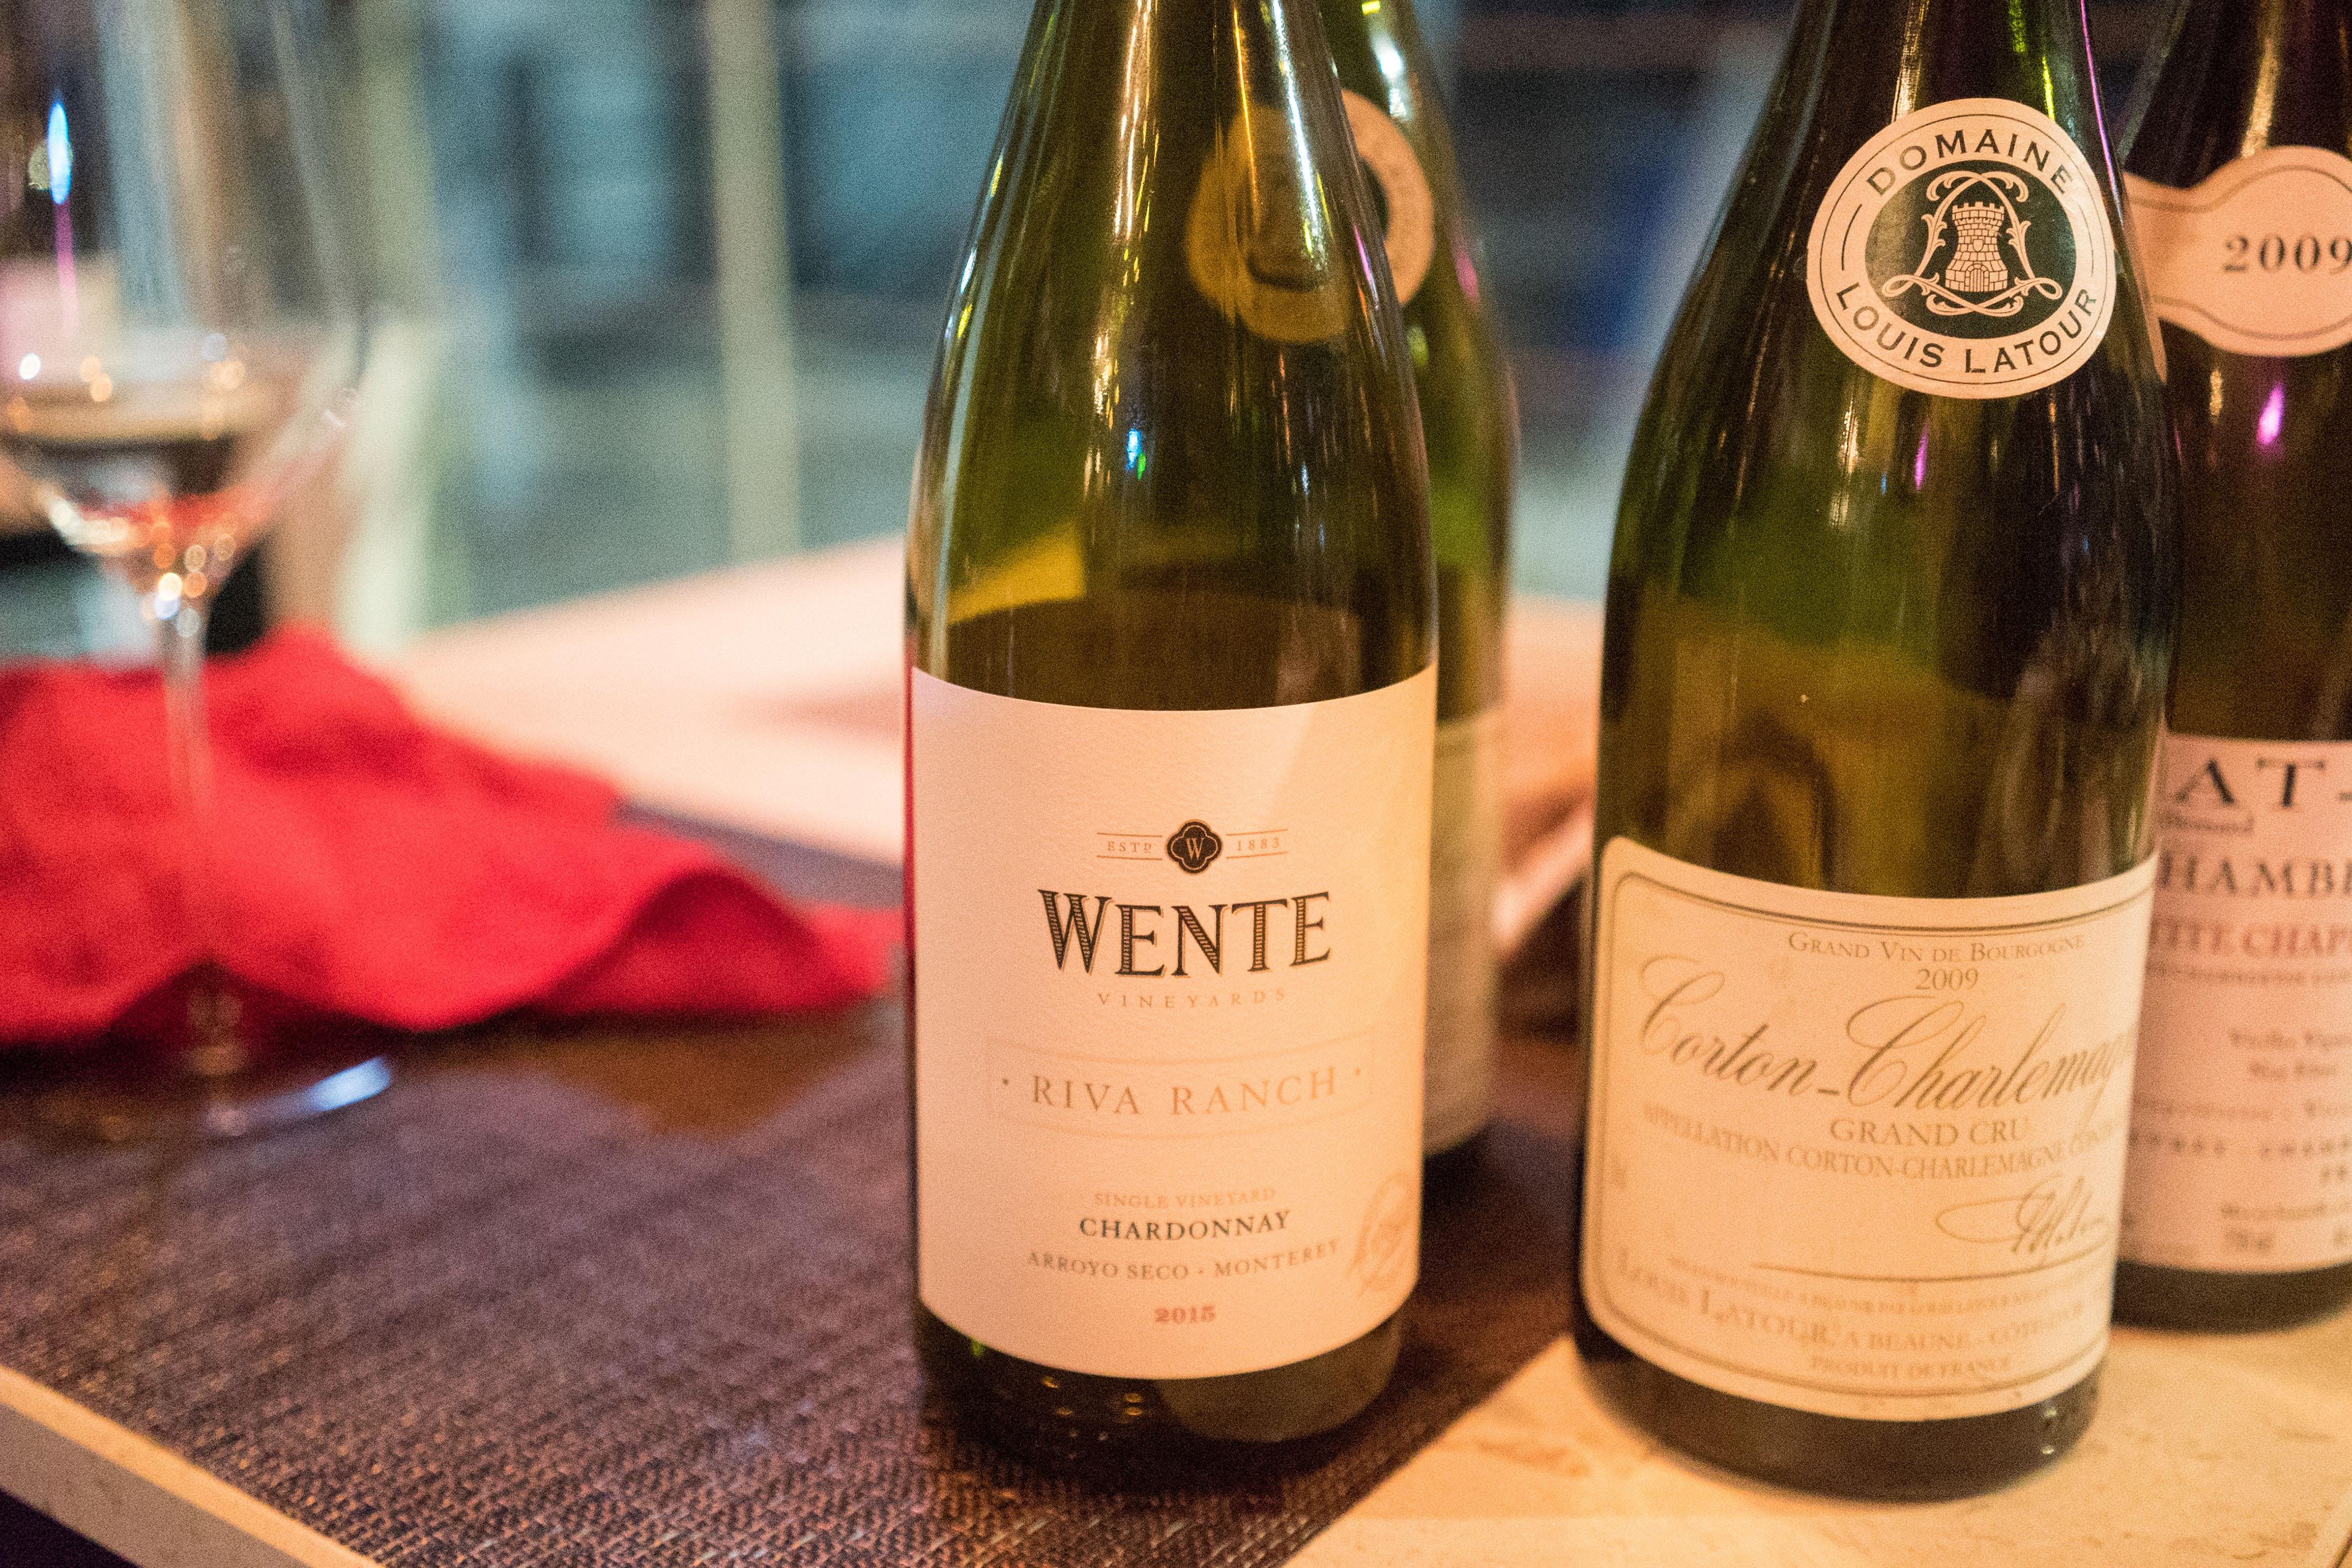 Wente Riva Ranch Chardonnay 2015